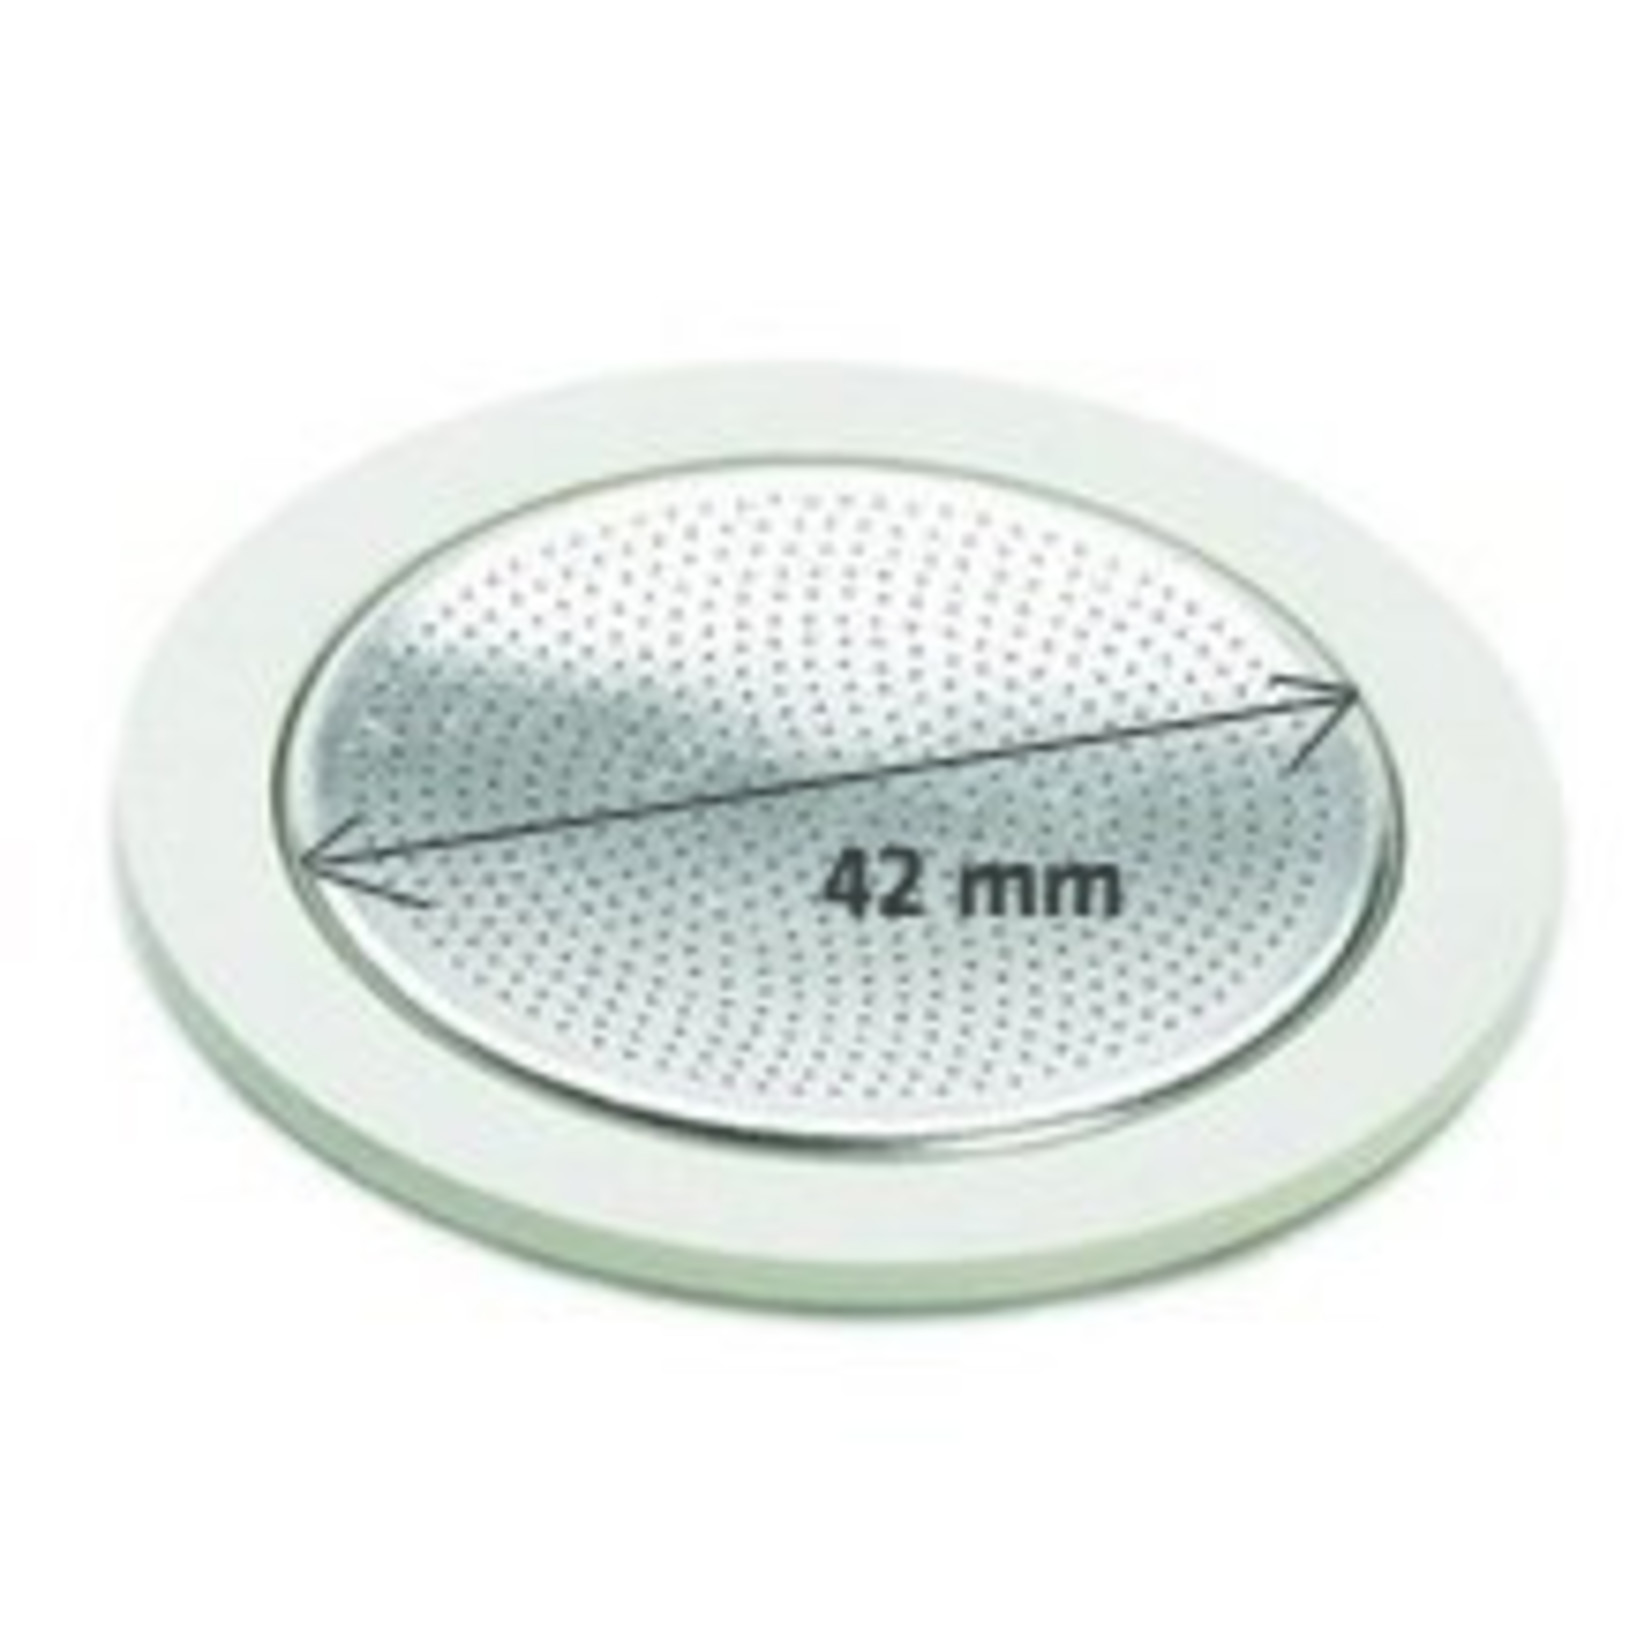 Bialetti Bialetti filterplaatje met rubberen ringen 2 kops aluminium